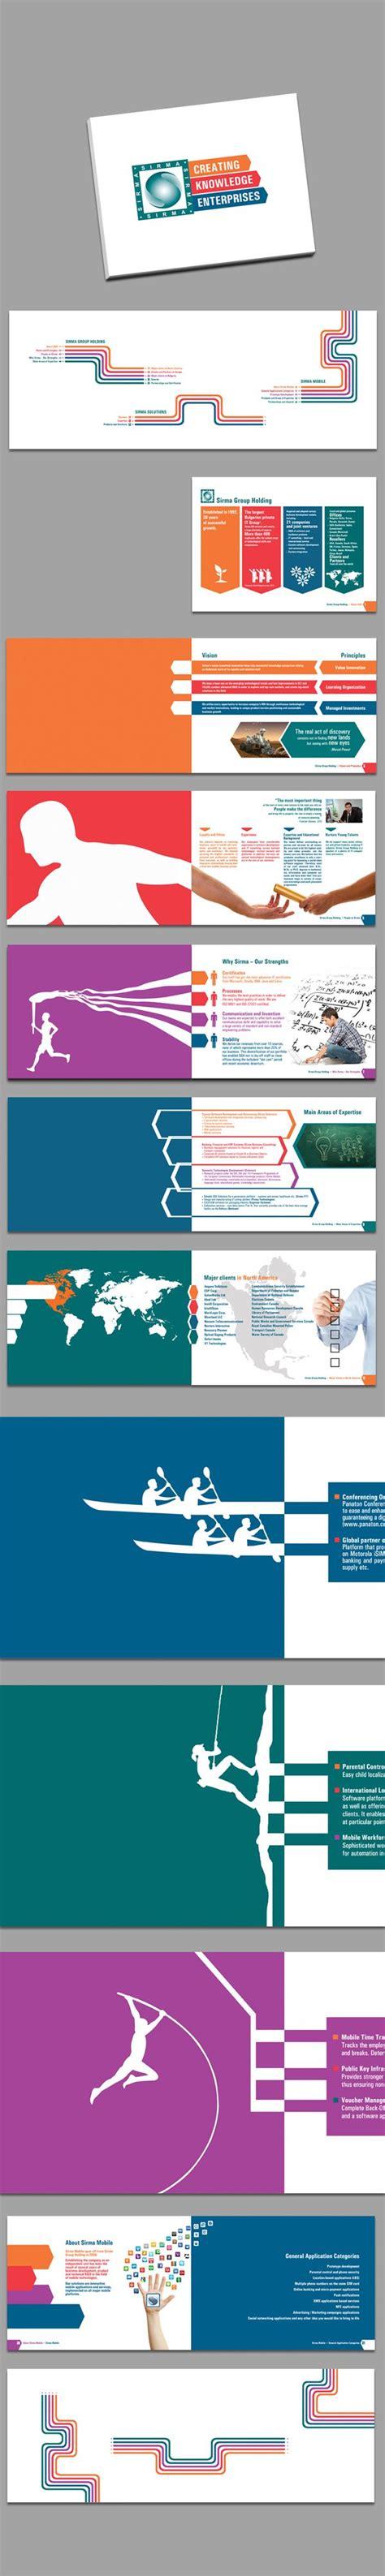 layout design tool website plan bedroom virtual kitchen designer furniture layout